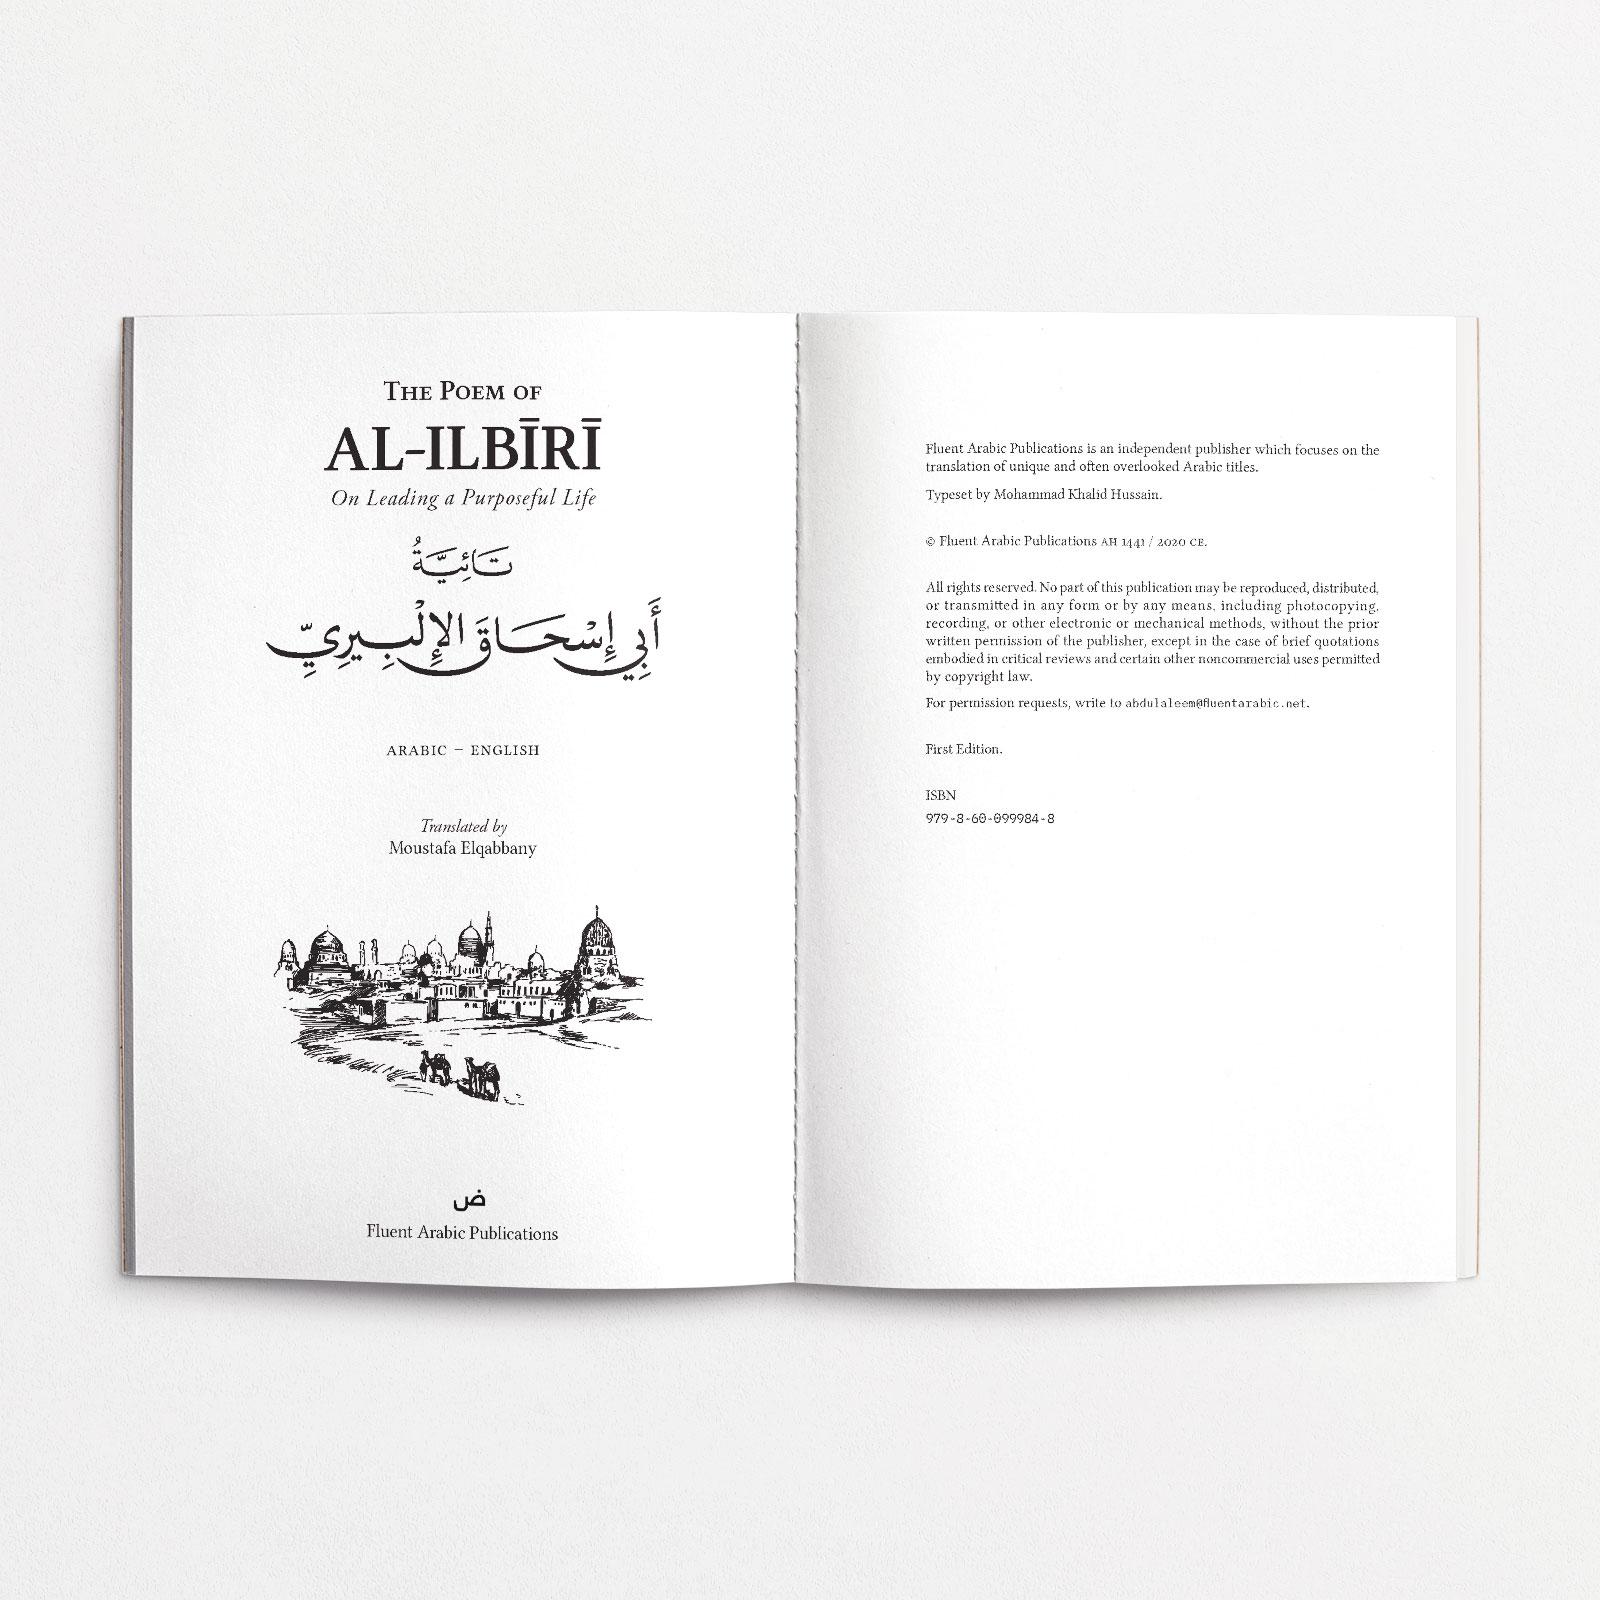 The poem of al-ilbiri